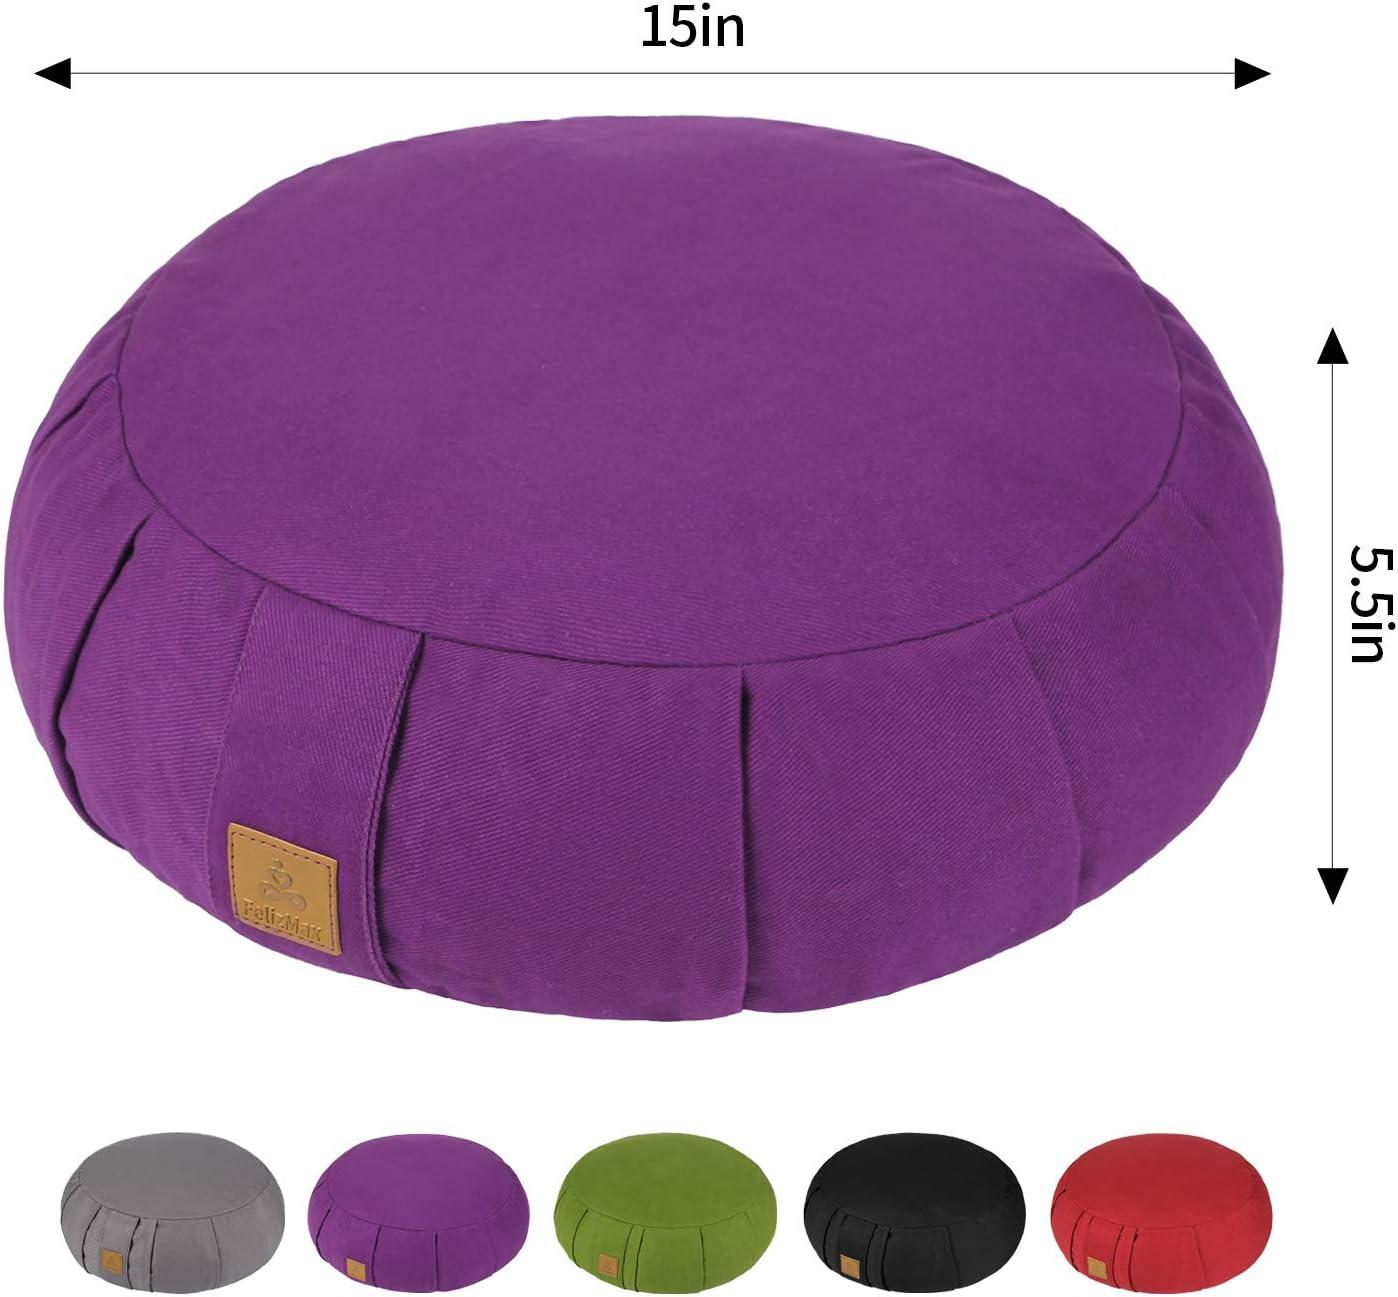 FelizMax Round Zafu Meditation Cushion, Zabuton Meditation Pillow, Yoga Bolster/Pillow, Floor seat, Zippered Organic Cotton Cover, Natural Buckwheat, ...